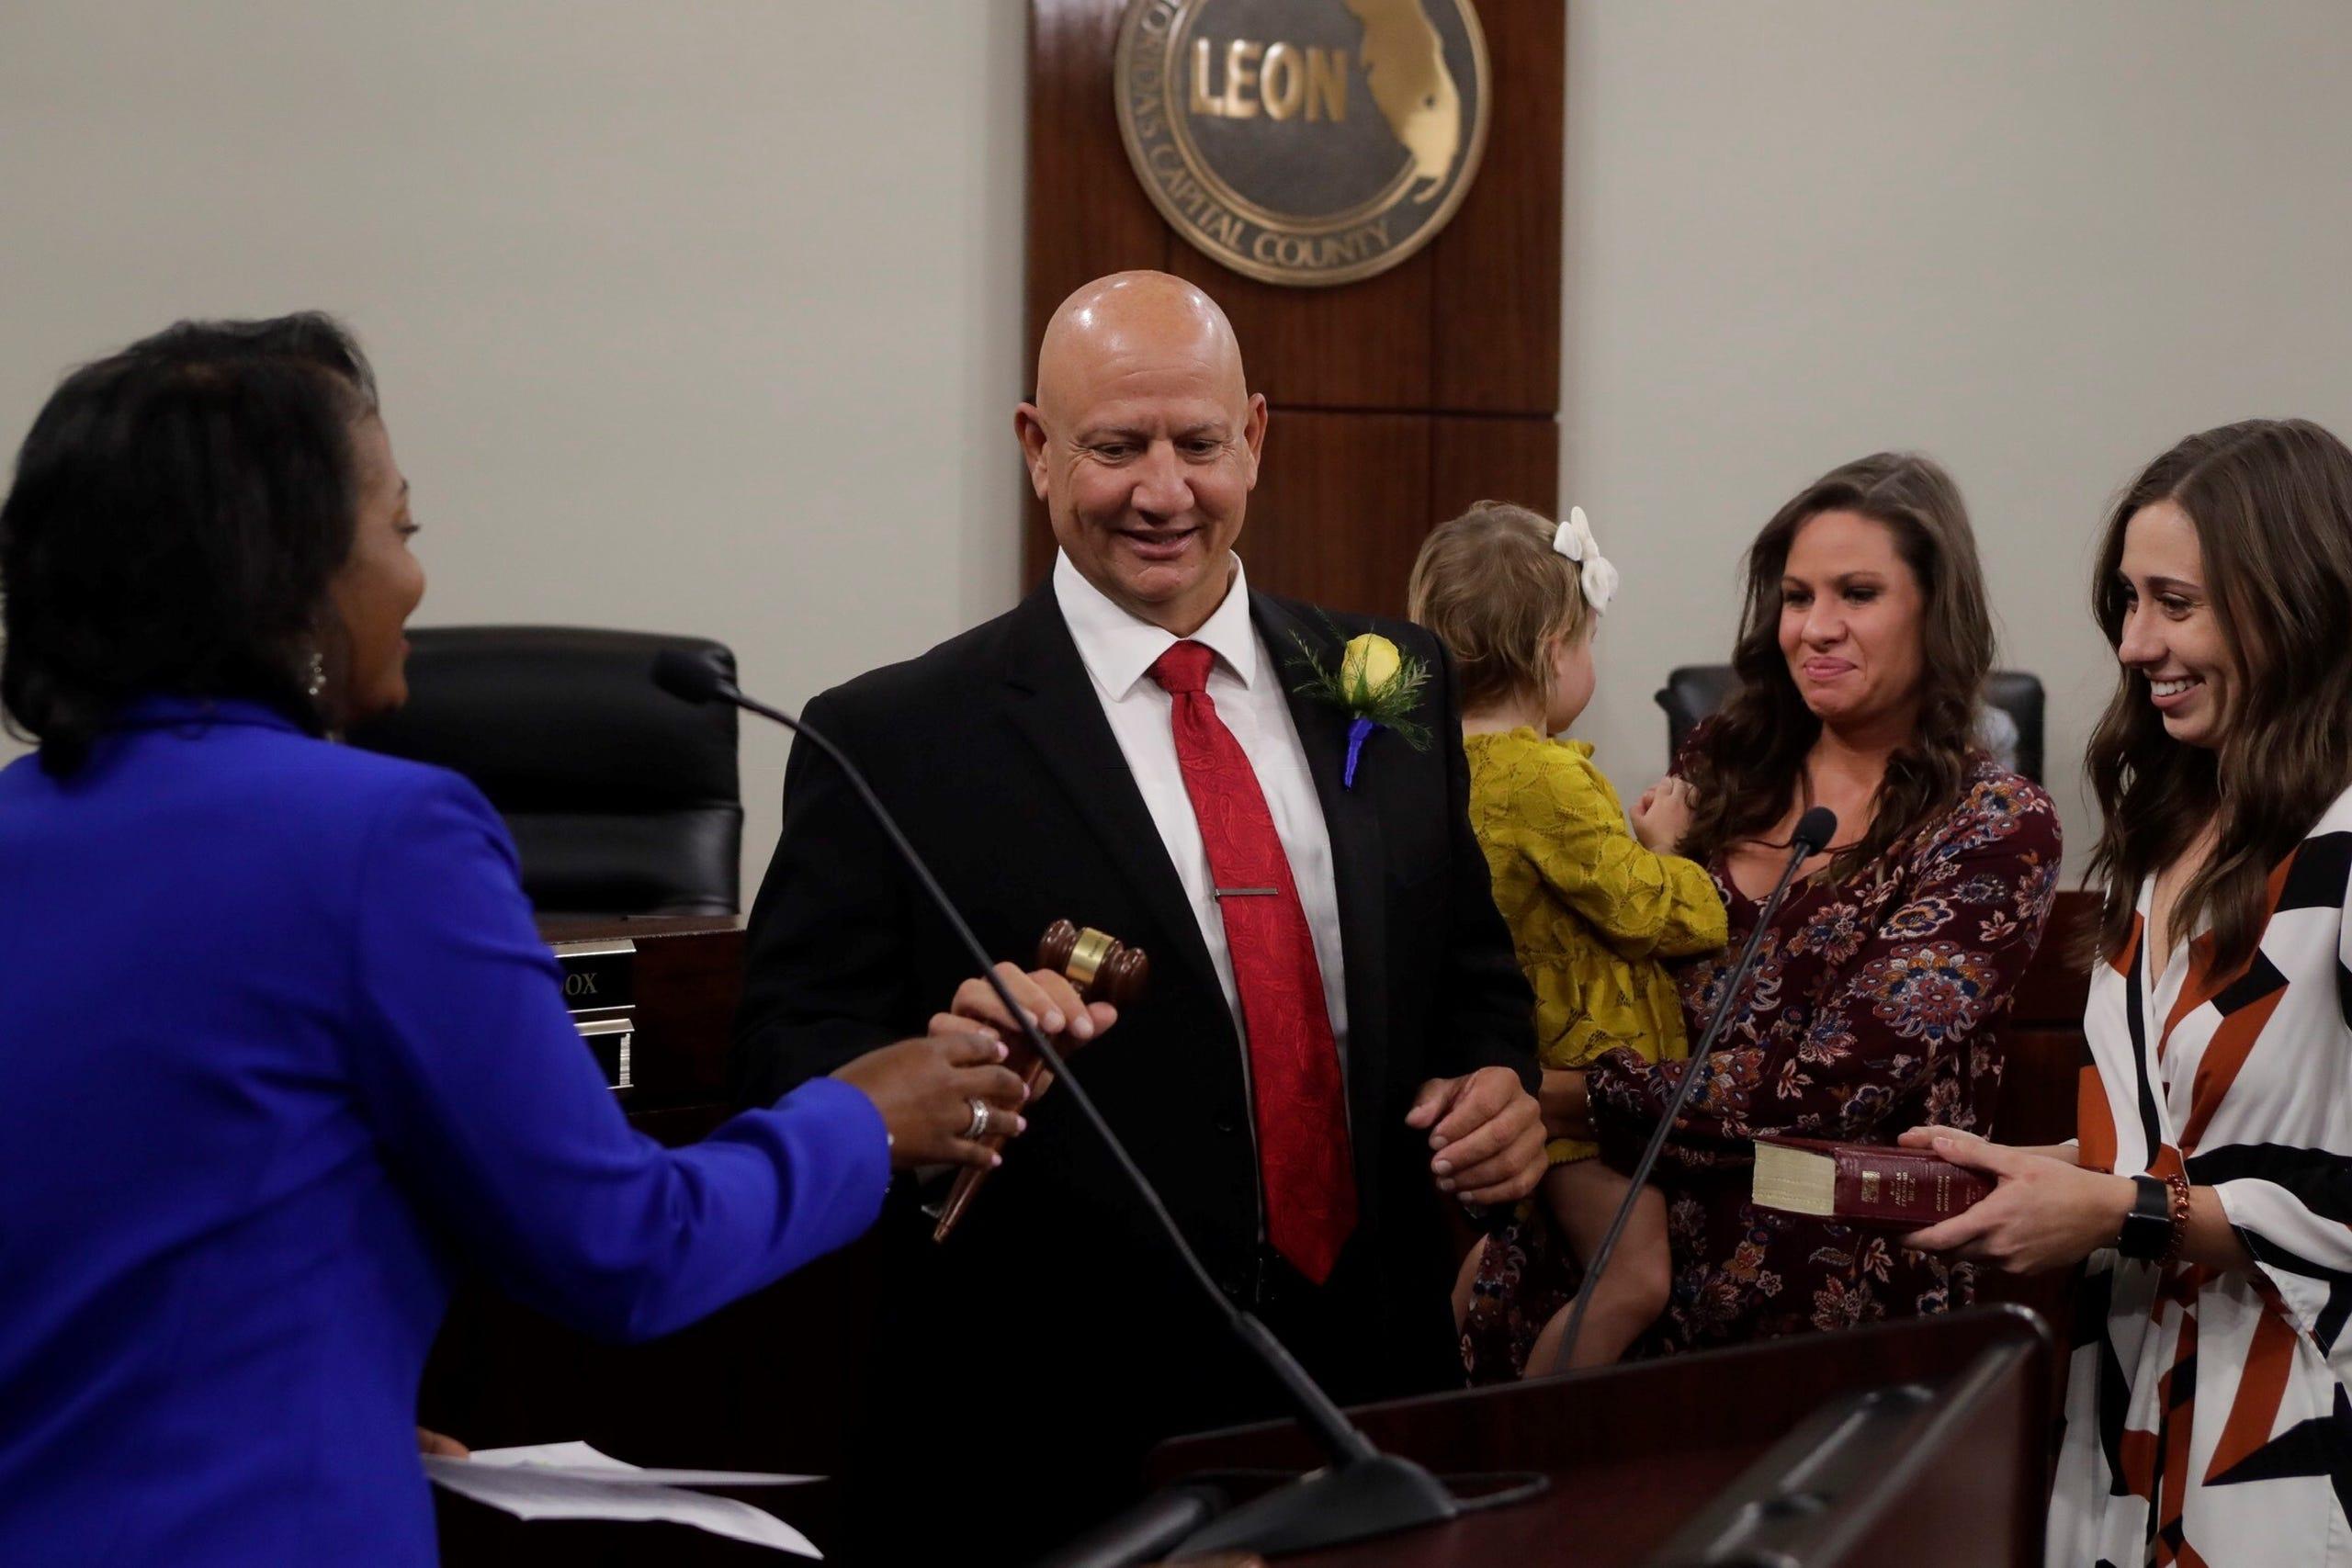 Rick Minor sworn in as Leon County commissioner